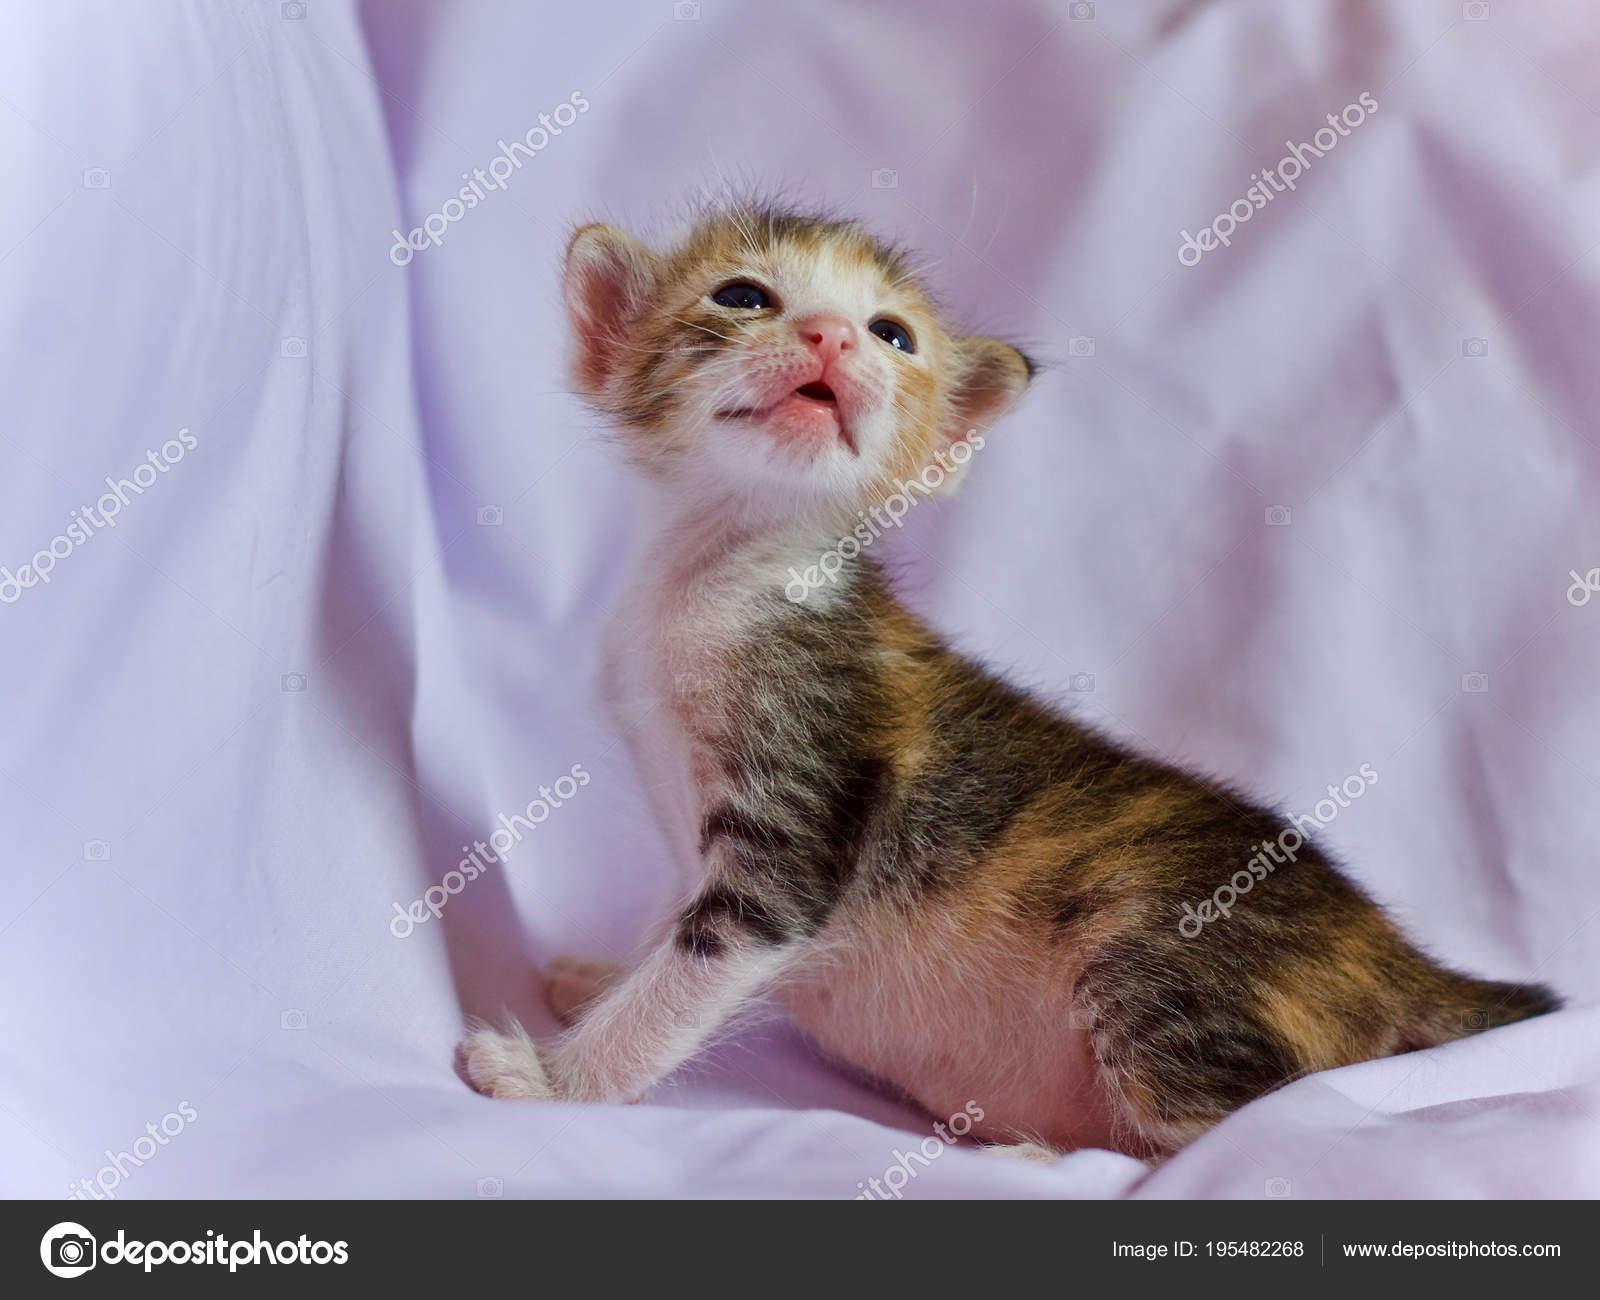 Baby Cute Kittens Kitten Cat Baby Cute Animal Stock Photo C Incubus 2525 Hotmail Com 195482268